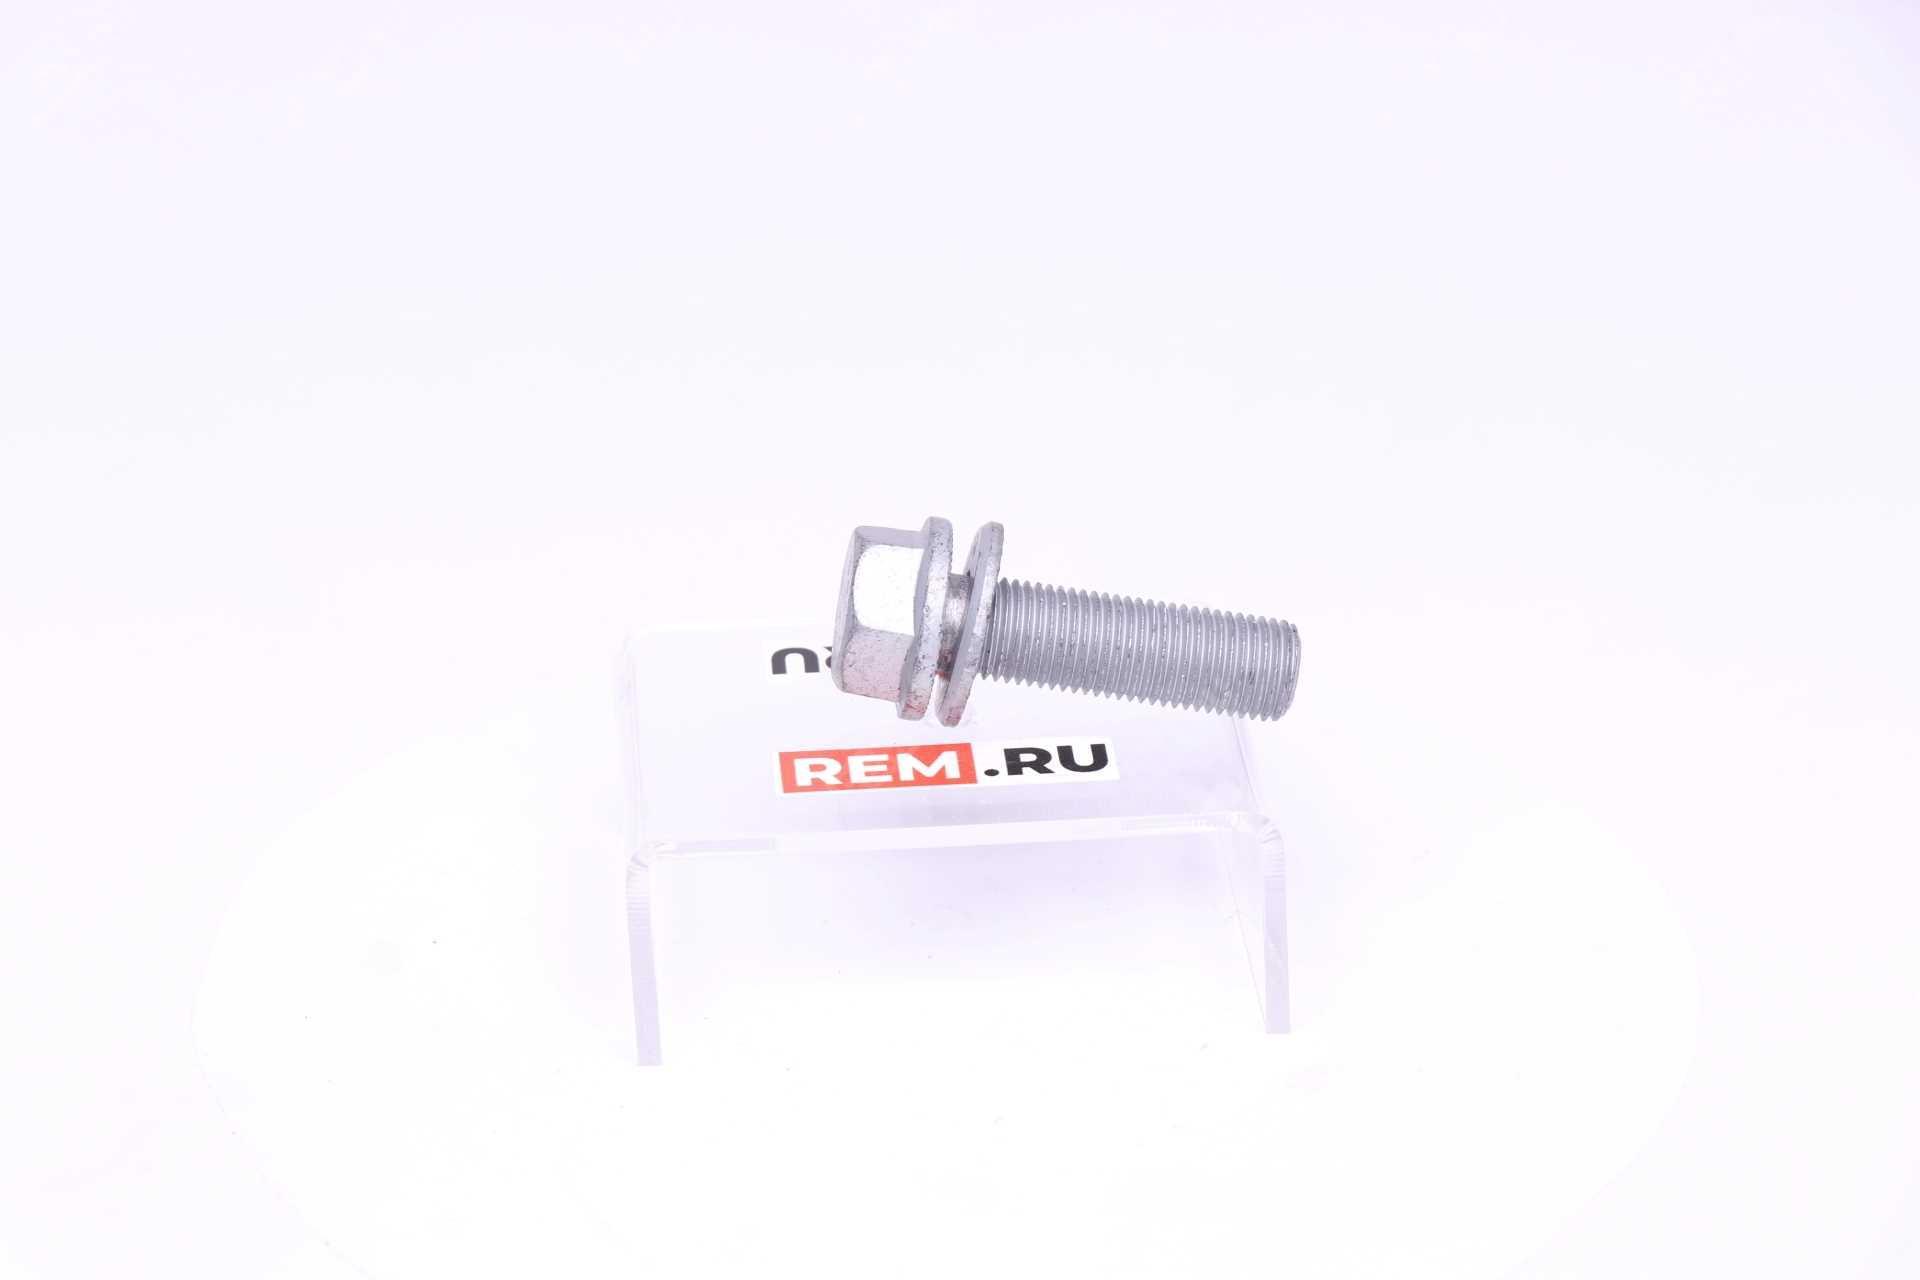 N91147601  болт (фото 3)